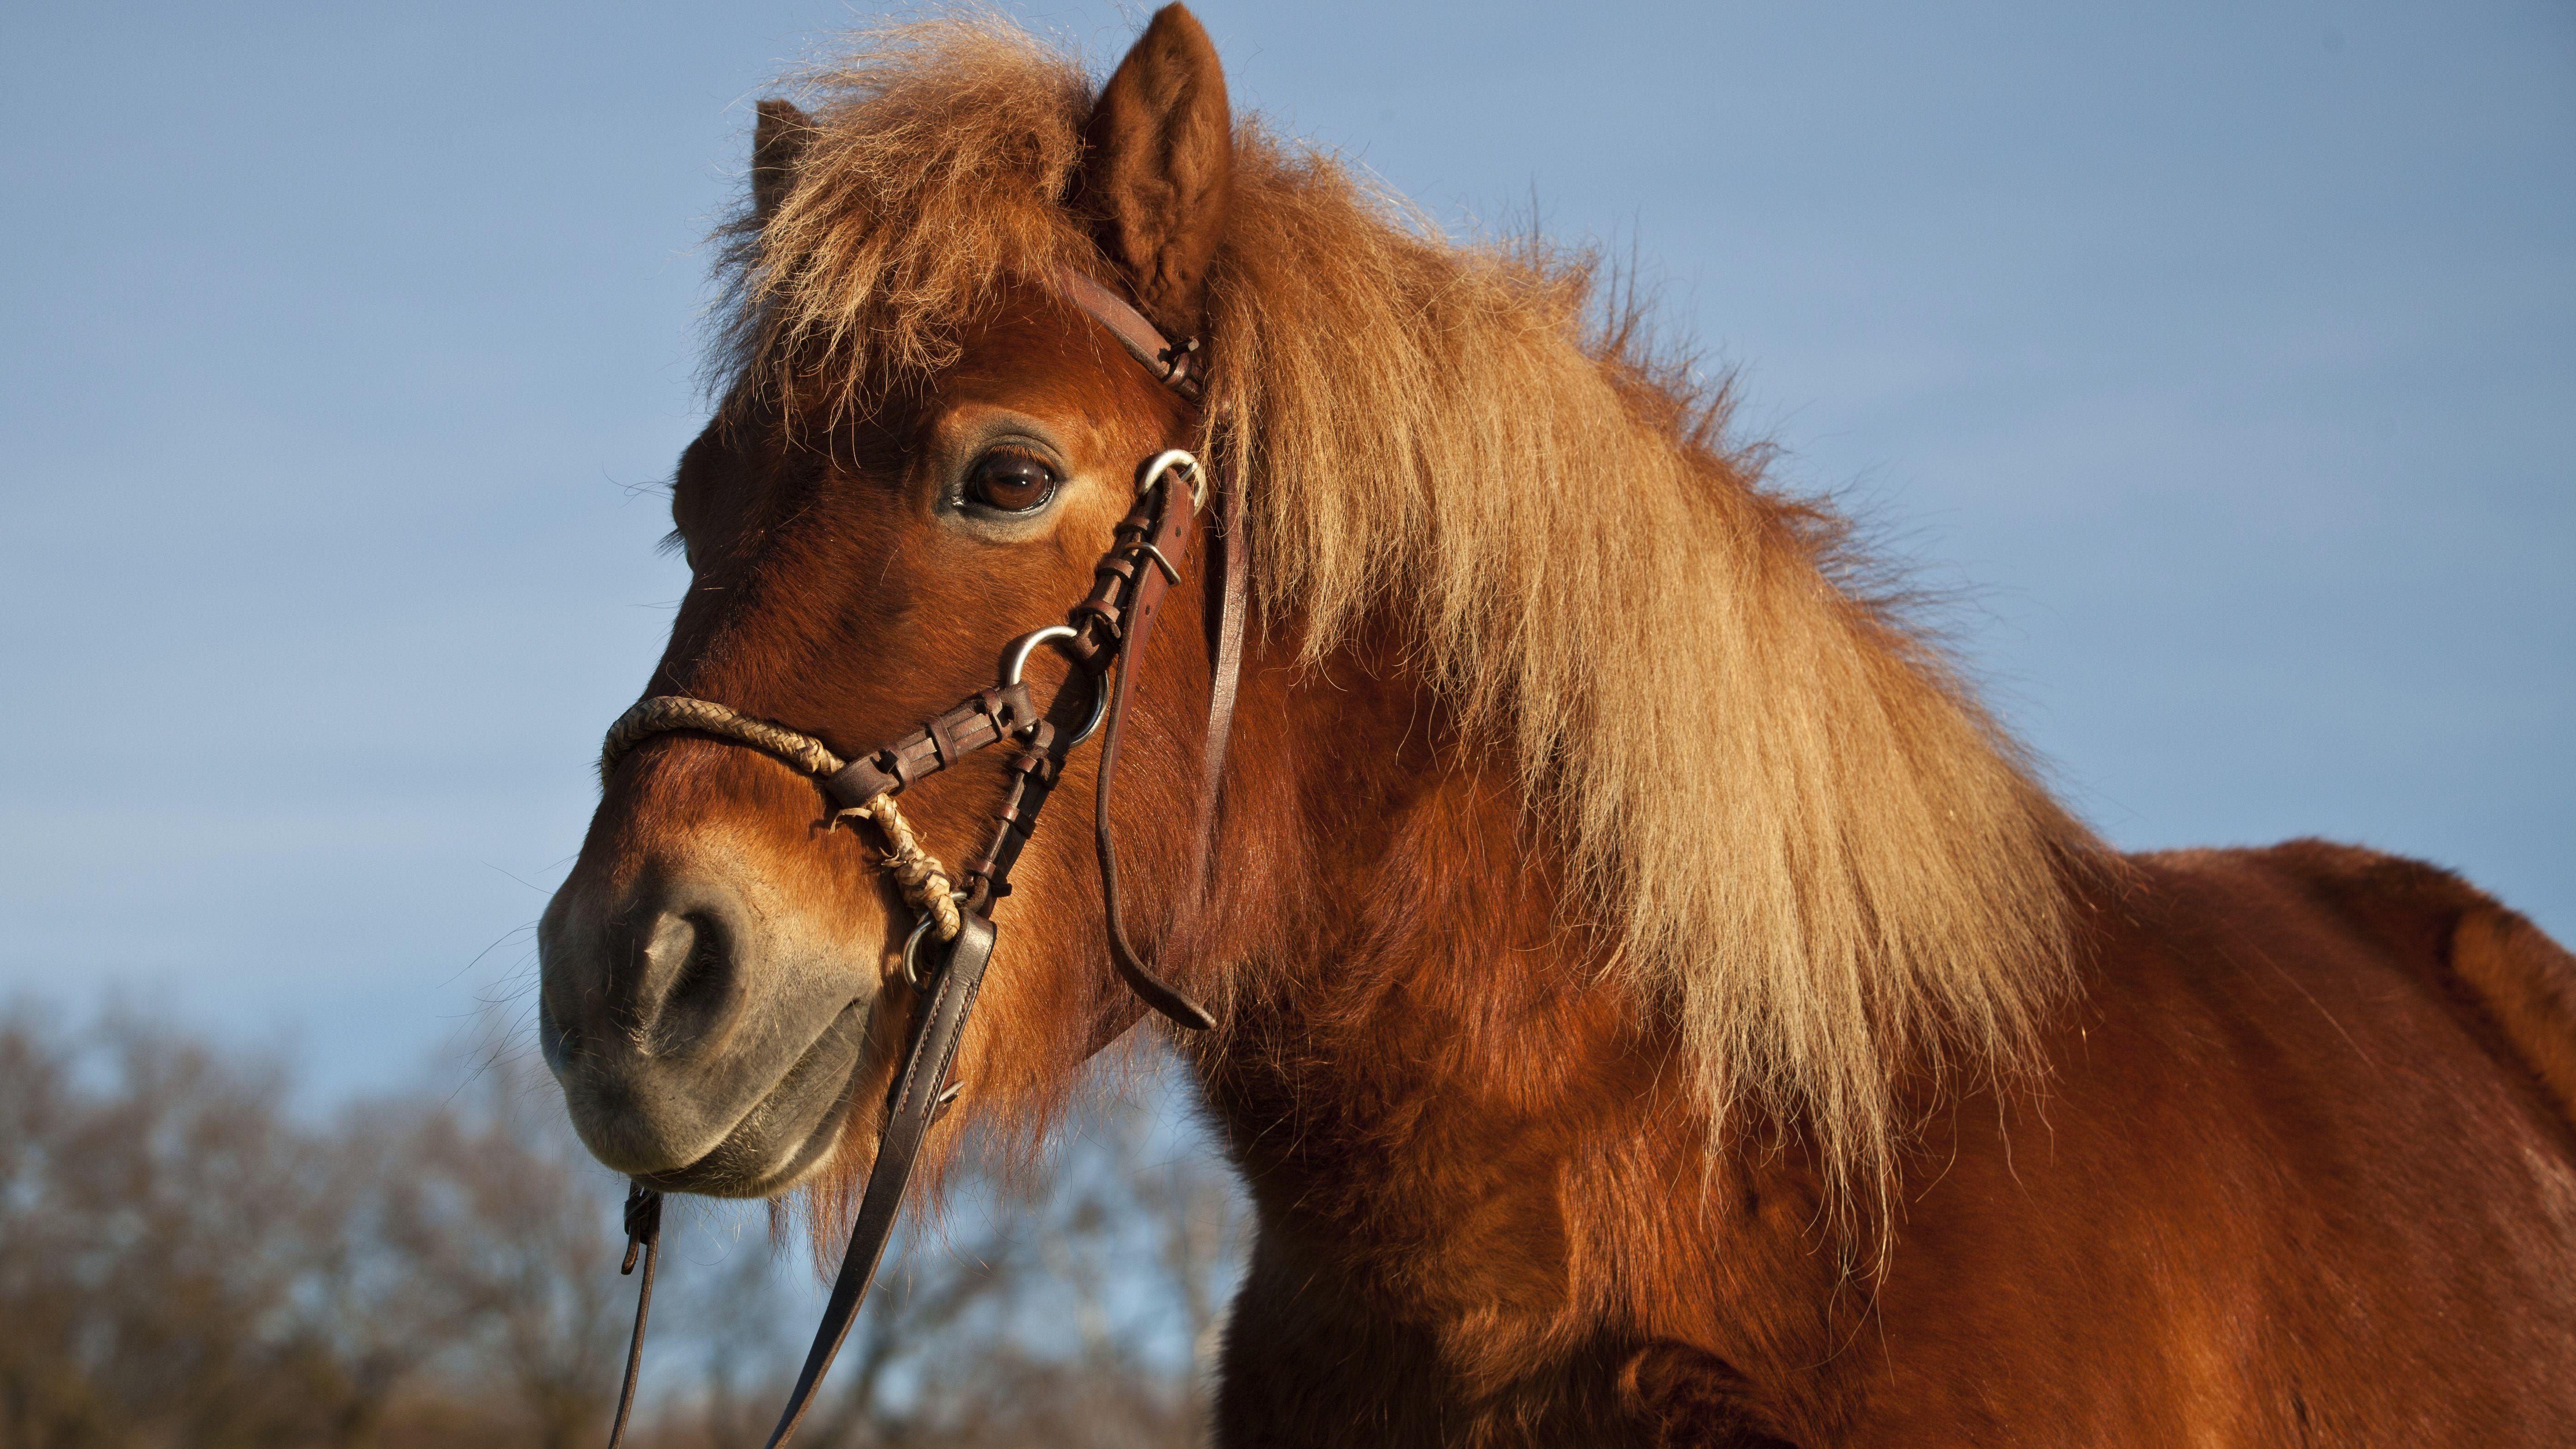 NEW HACKAMORE TRAINING TACK FLEECE LEATHER HORSE WESTERN SHANKS BITLESS BIT